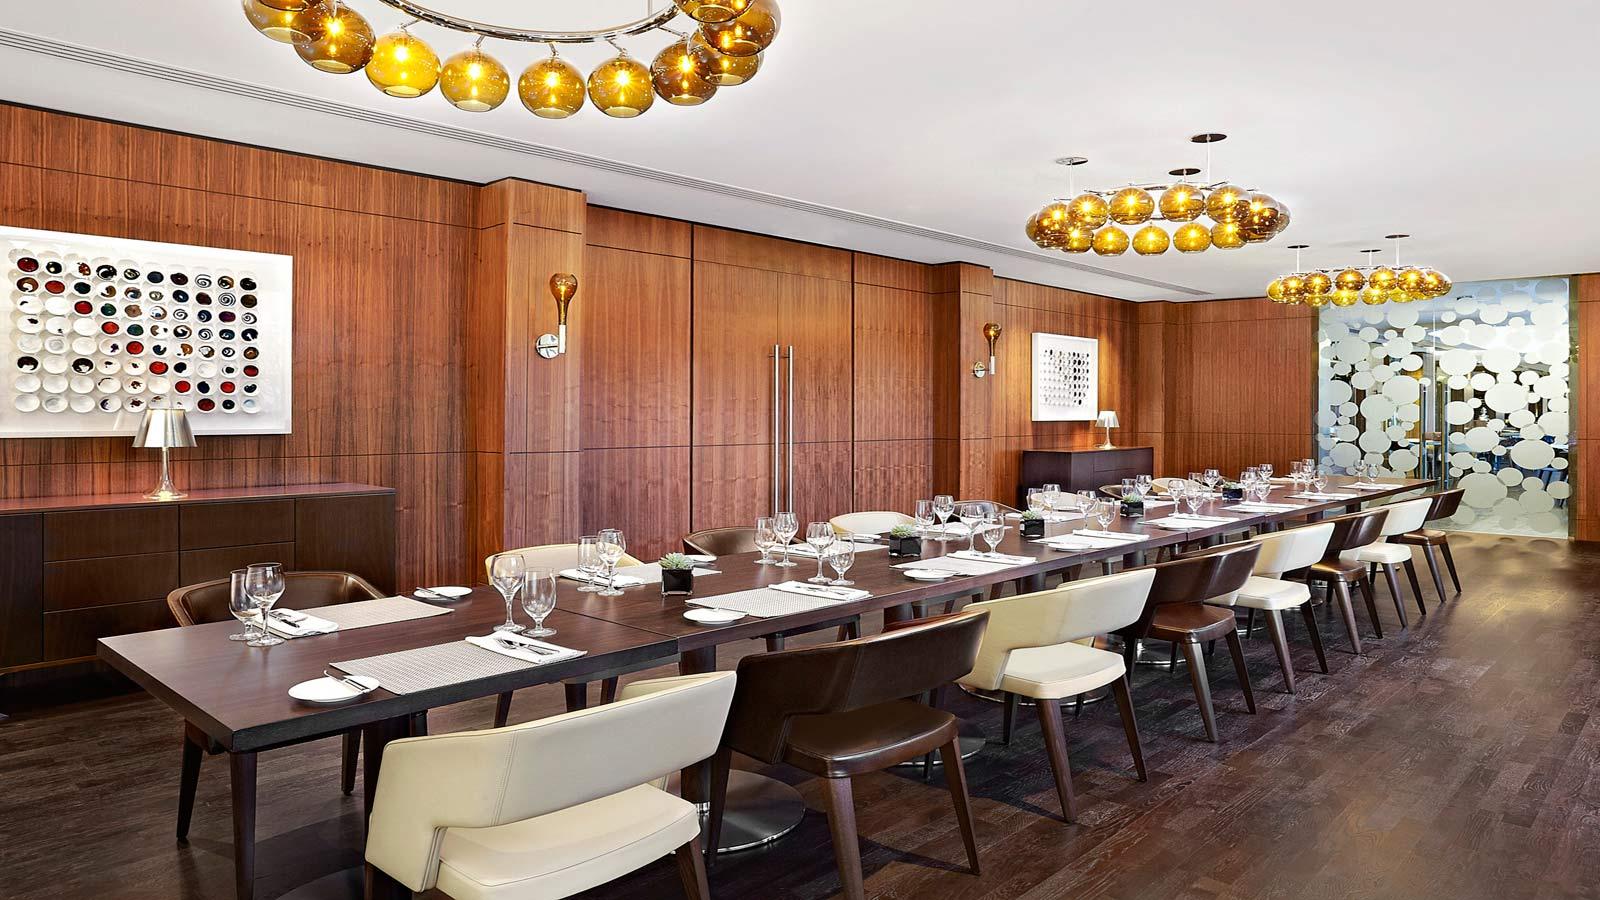 meeting rooms edinburgh sheraton edinburgh hotel private dining specifications room size